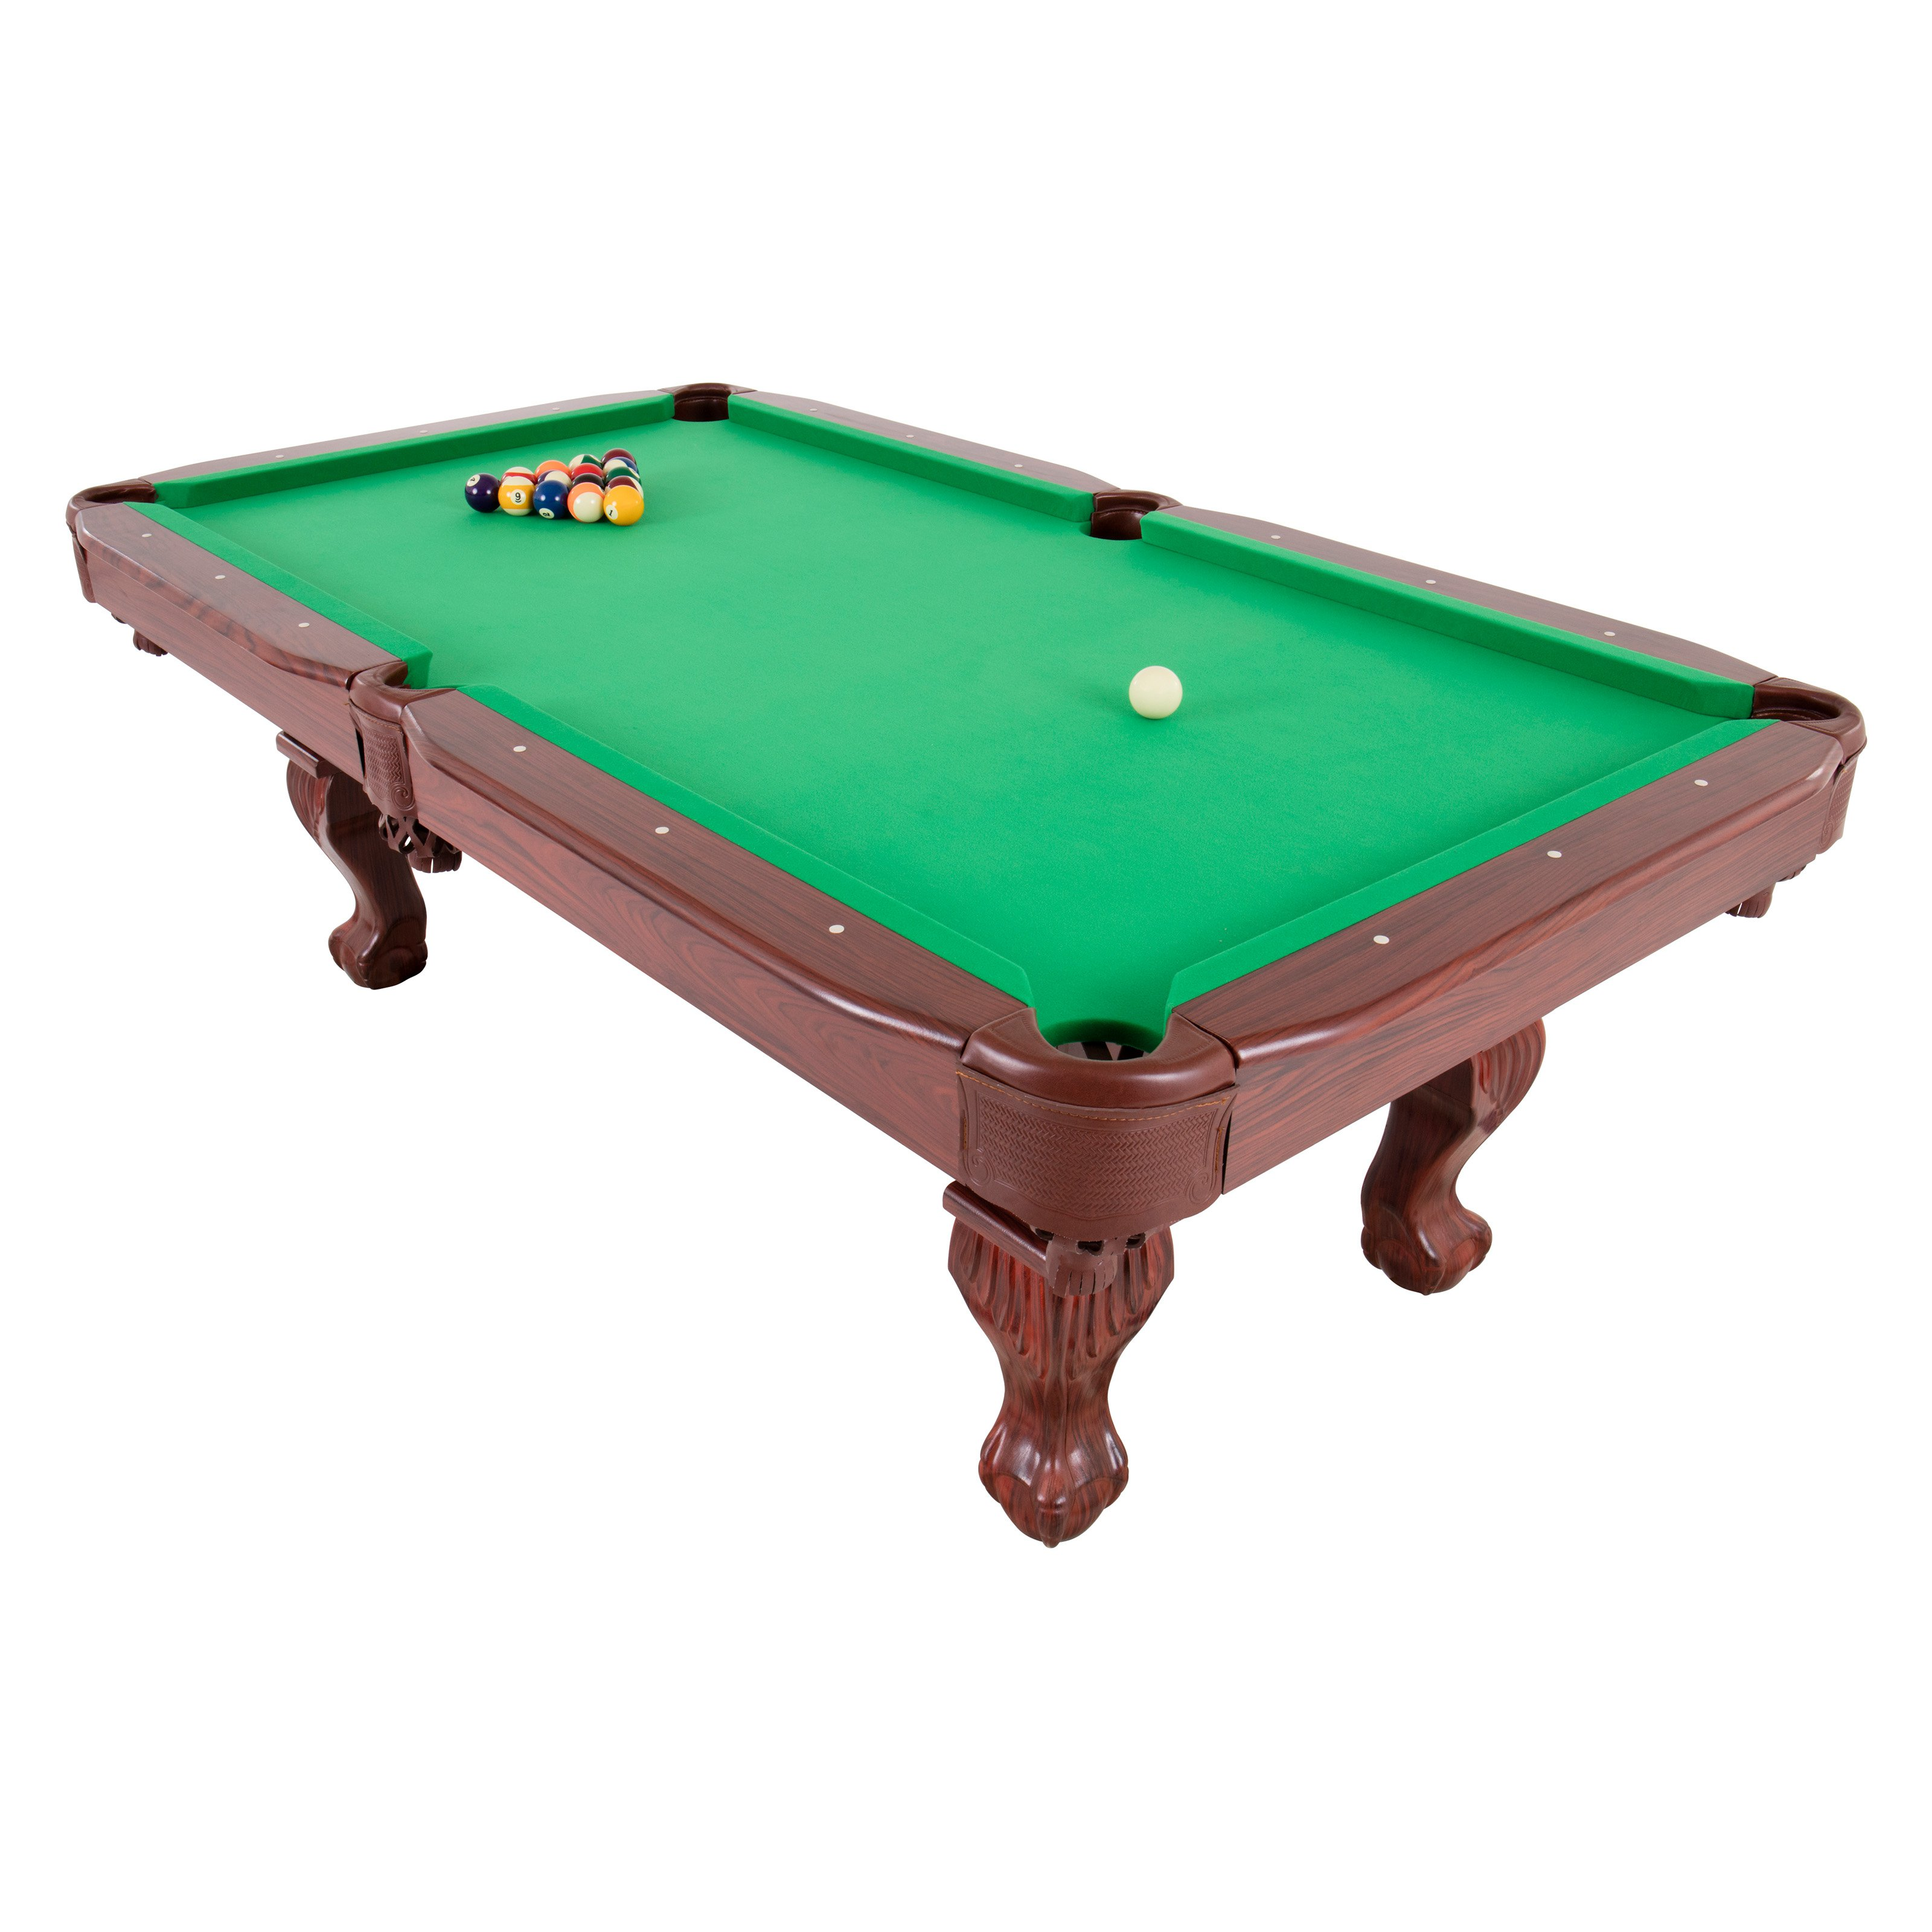 Mizerak Pool Table | Pool Tables at Walmart | 6 Foot Pool Tables